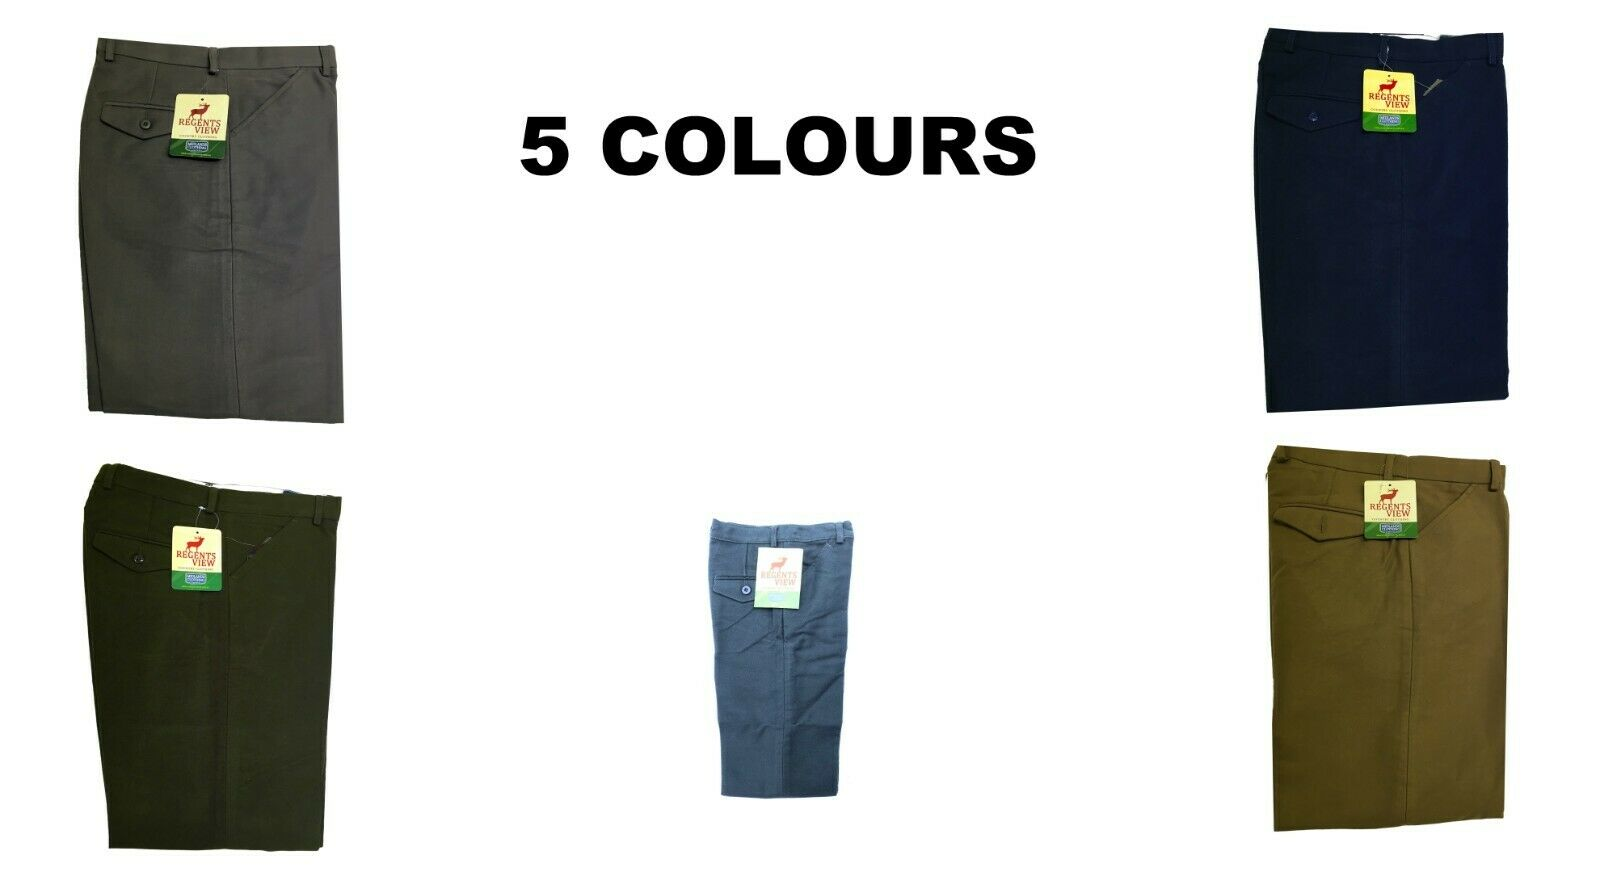 5colours Regents View childrens Superior Stitching 100% Cotton Moleskin Trousers